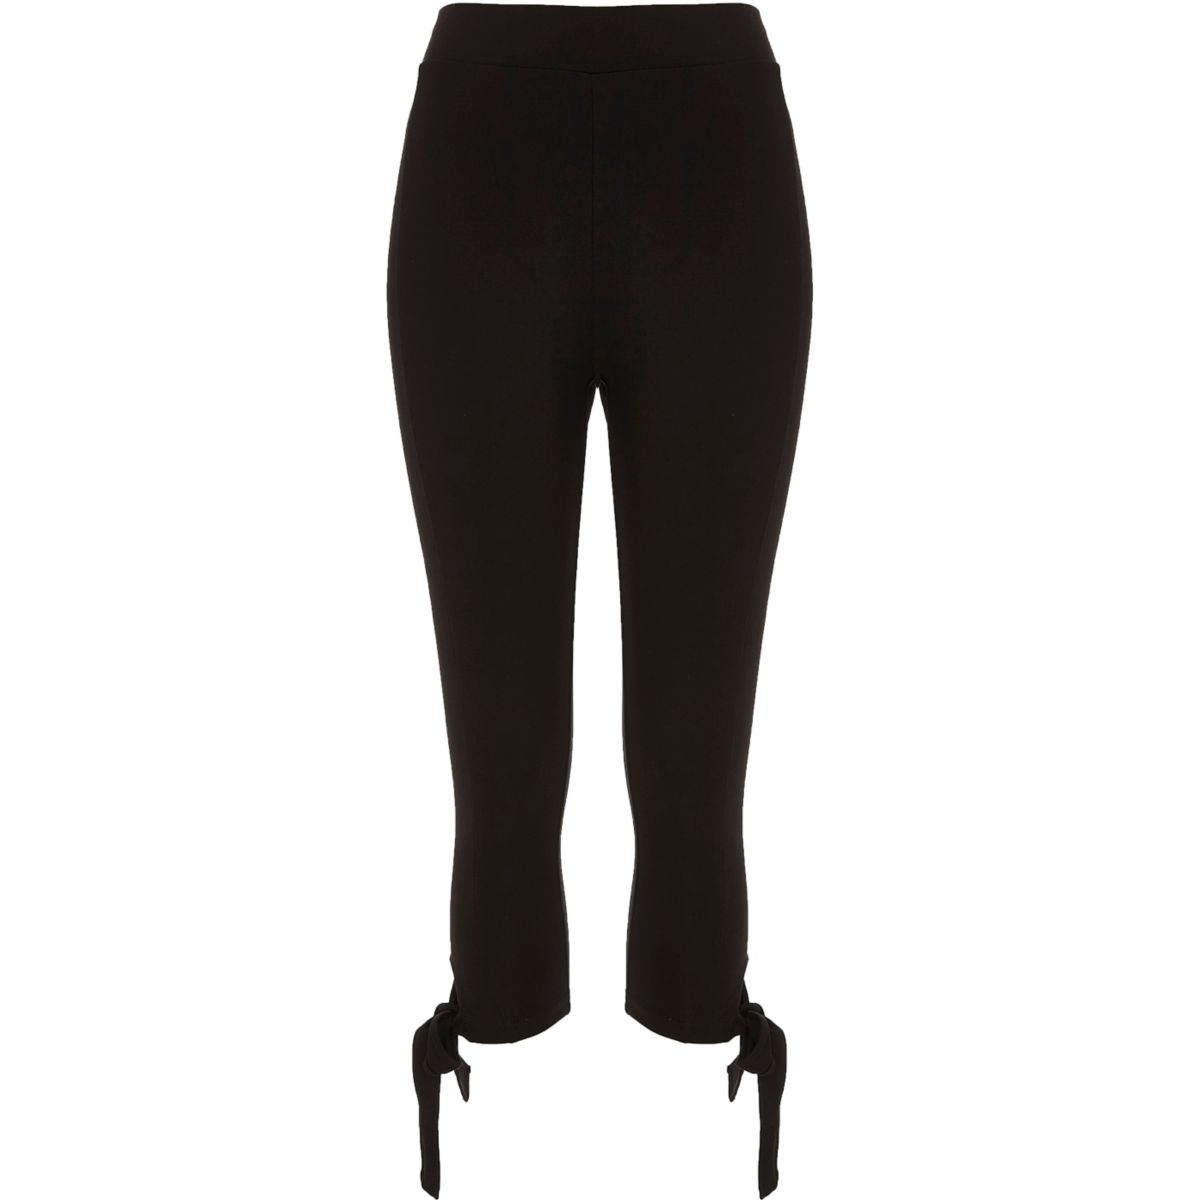 Black ponte bow leggings